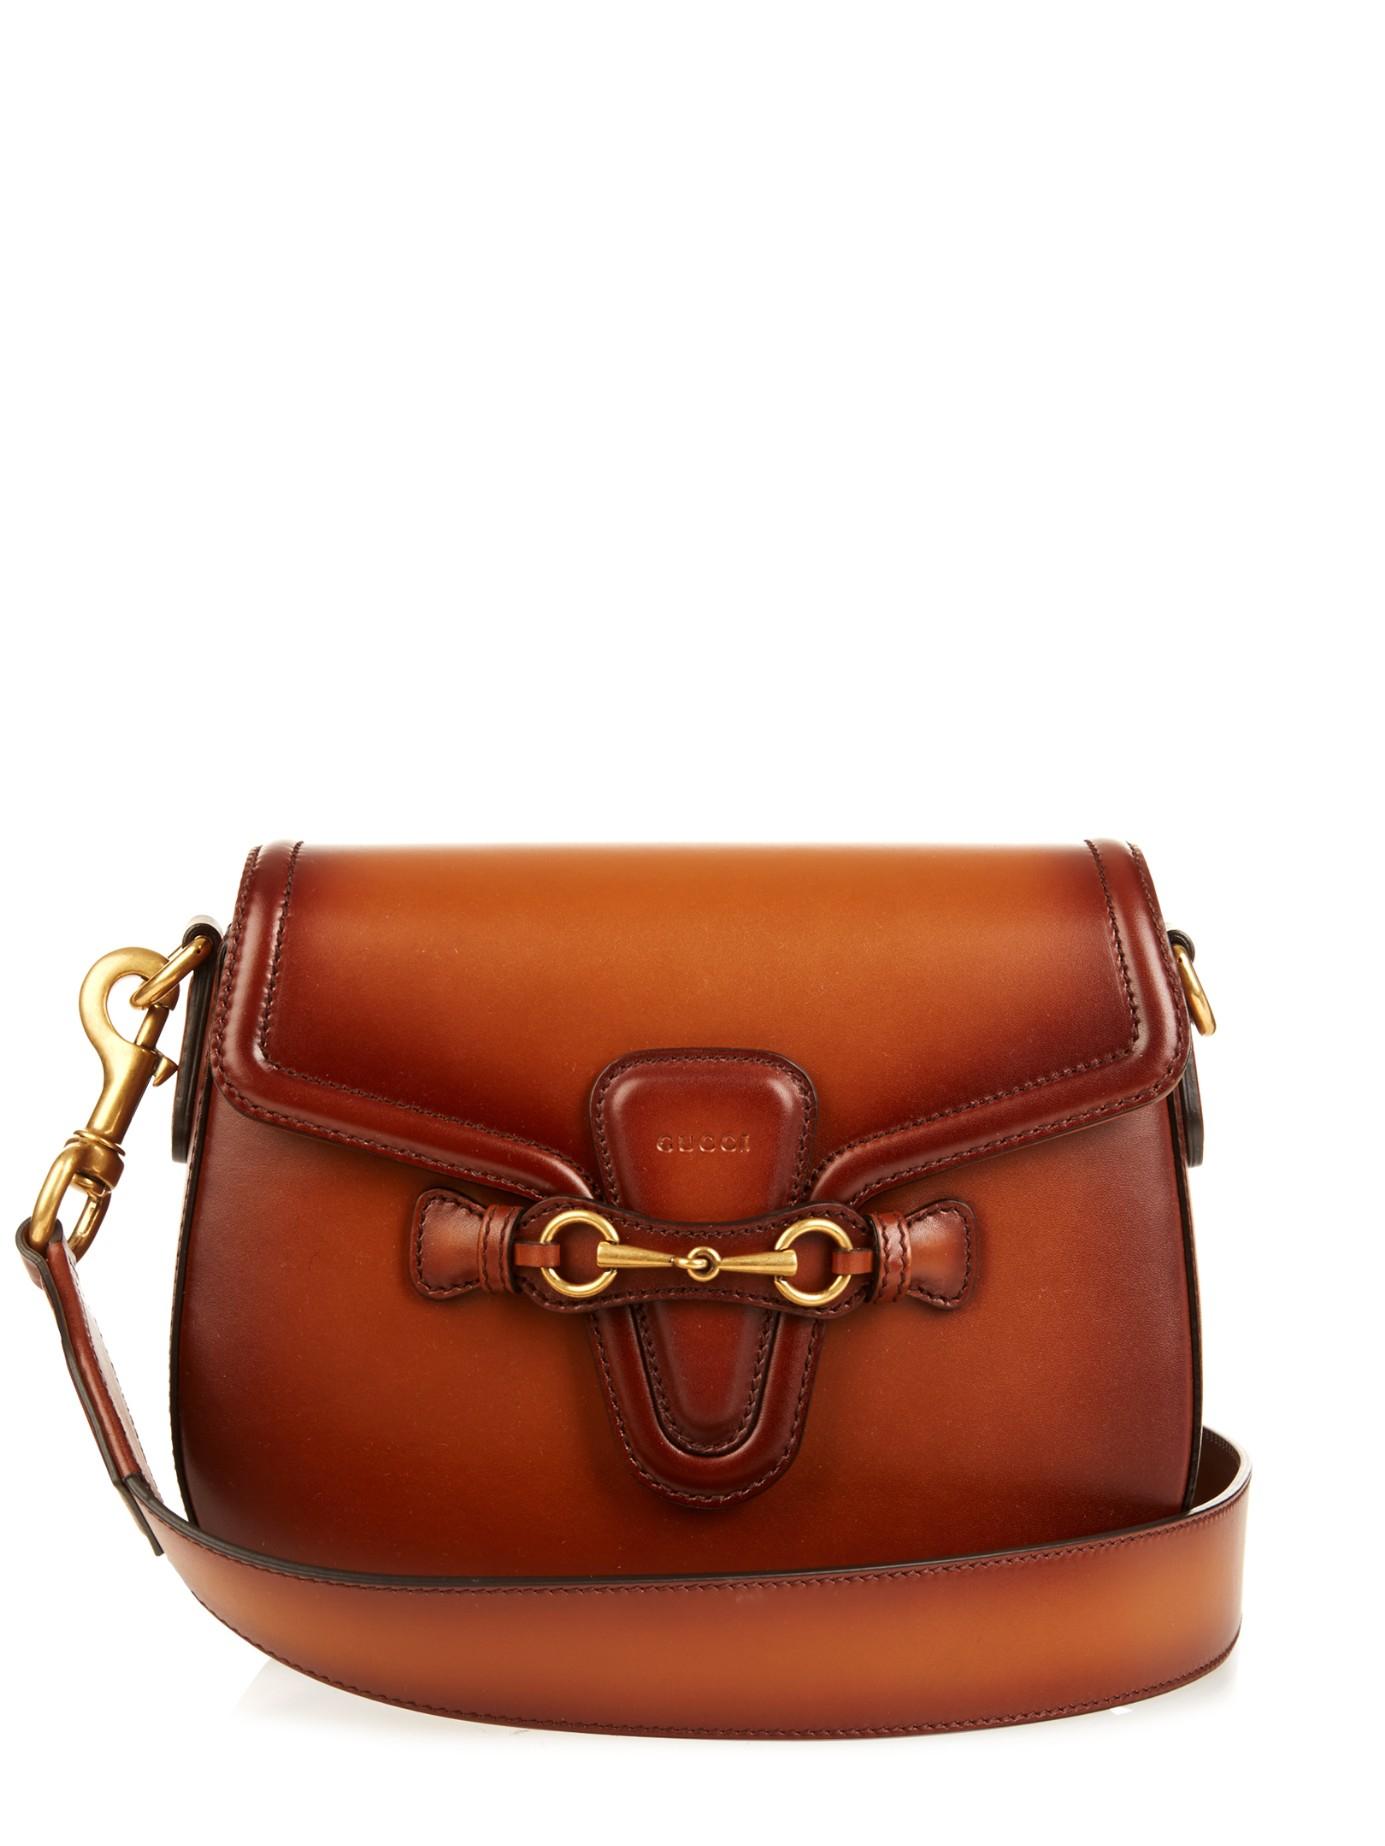 7ce222e901ab9b Gucci Lady Web Medium Leather Shoulder Bag in Brown - Lyst